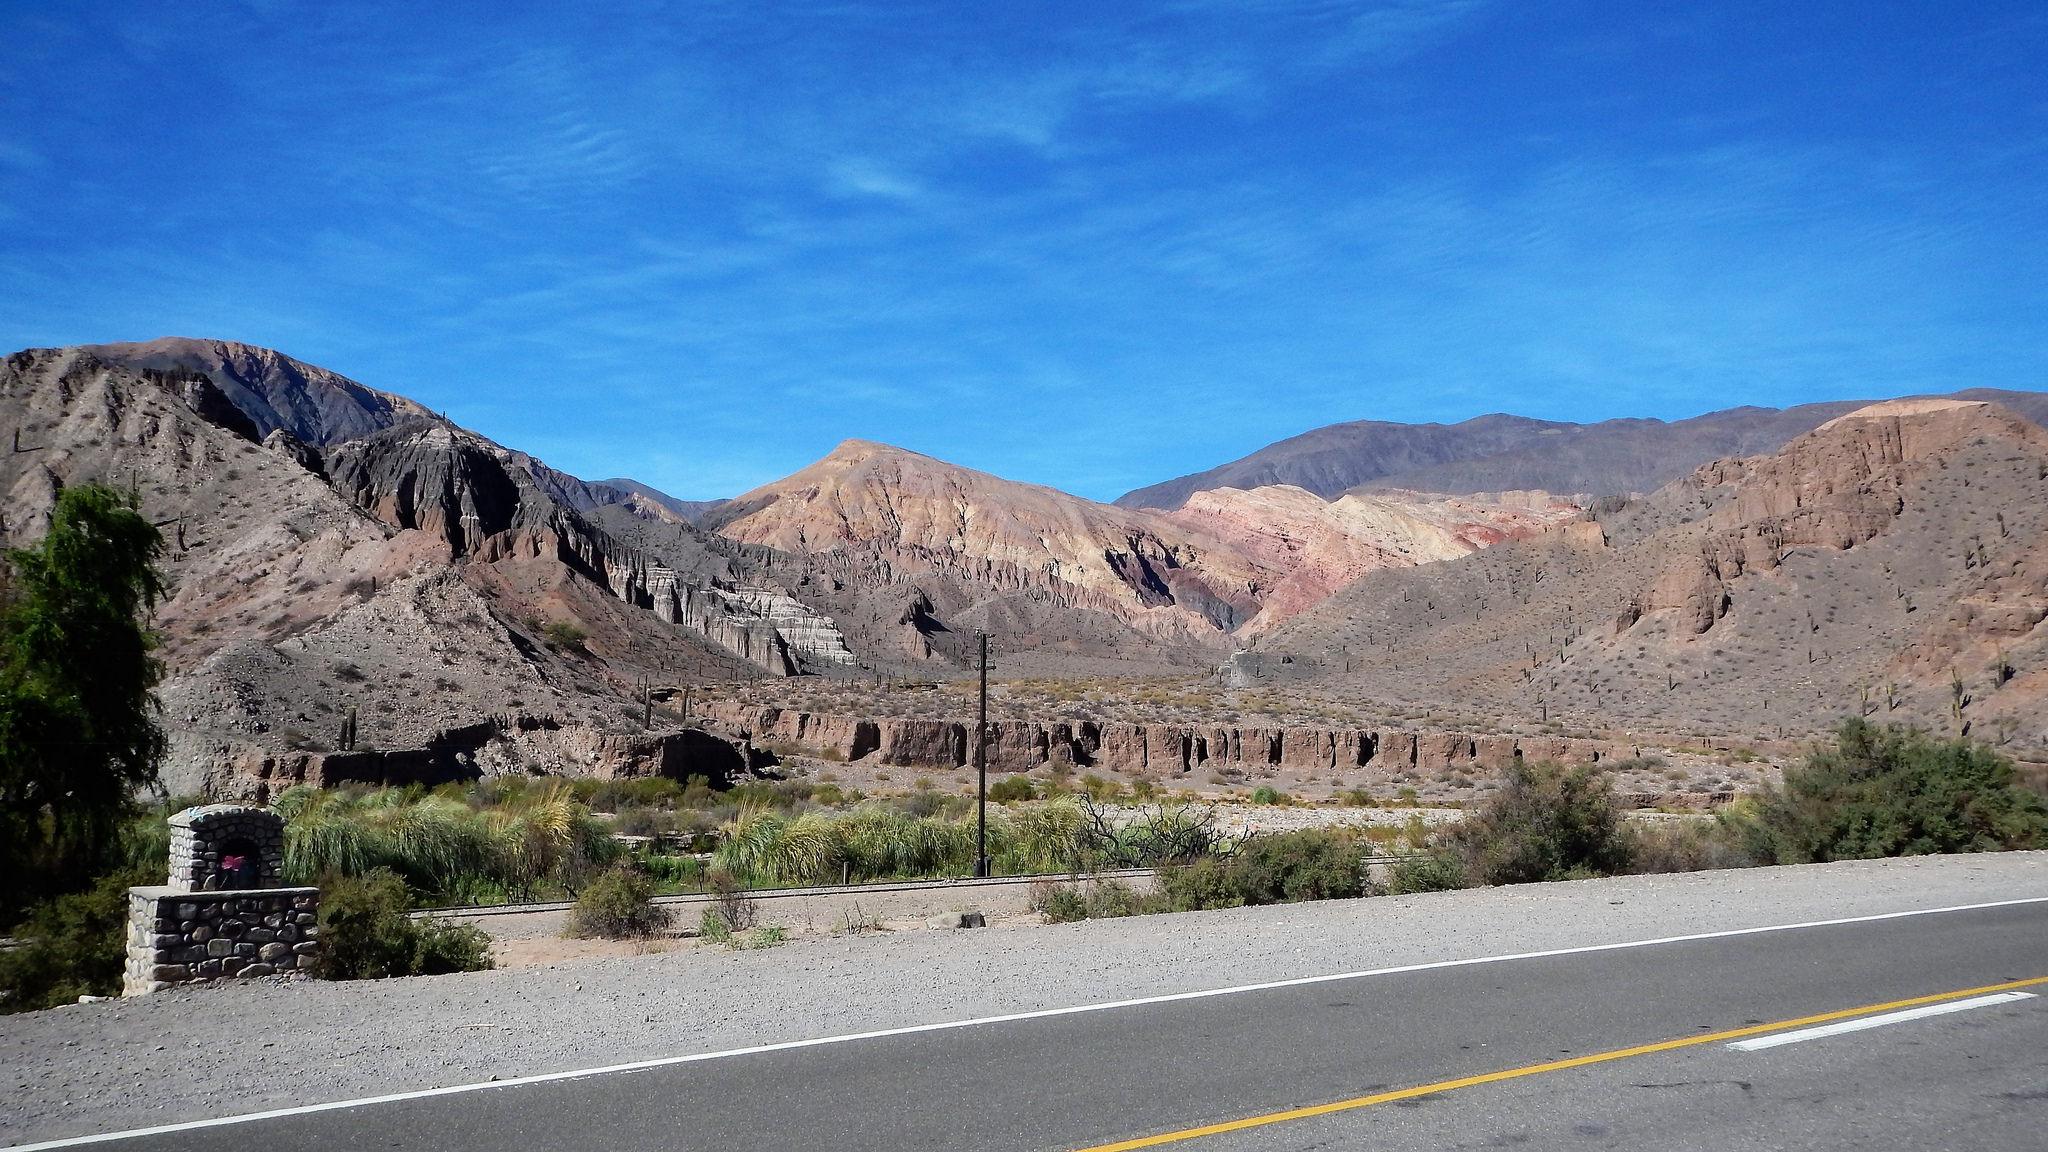 Quebrada del Toro - Madrid to Murcia Road Trip Route